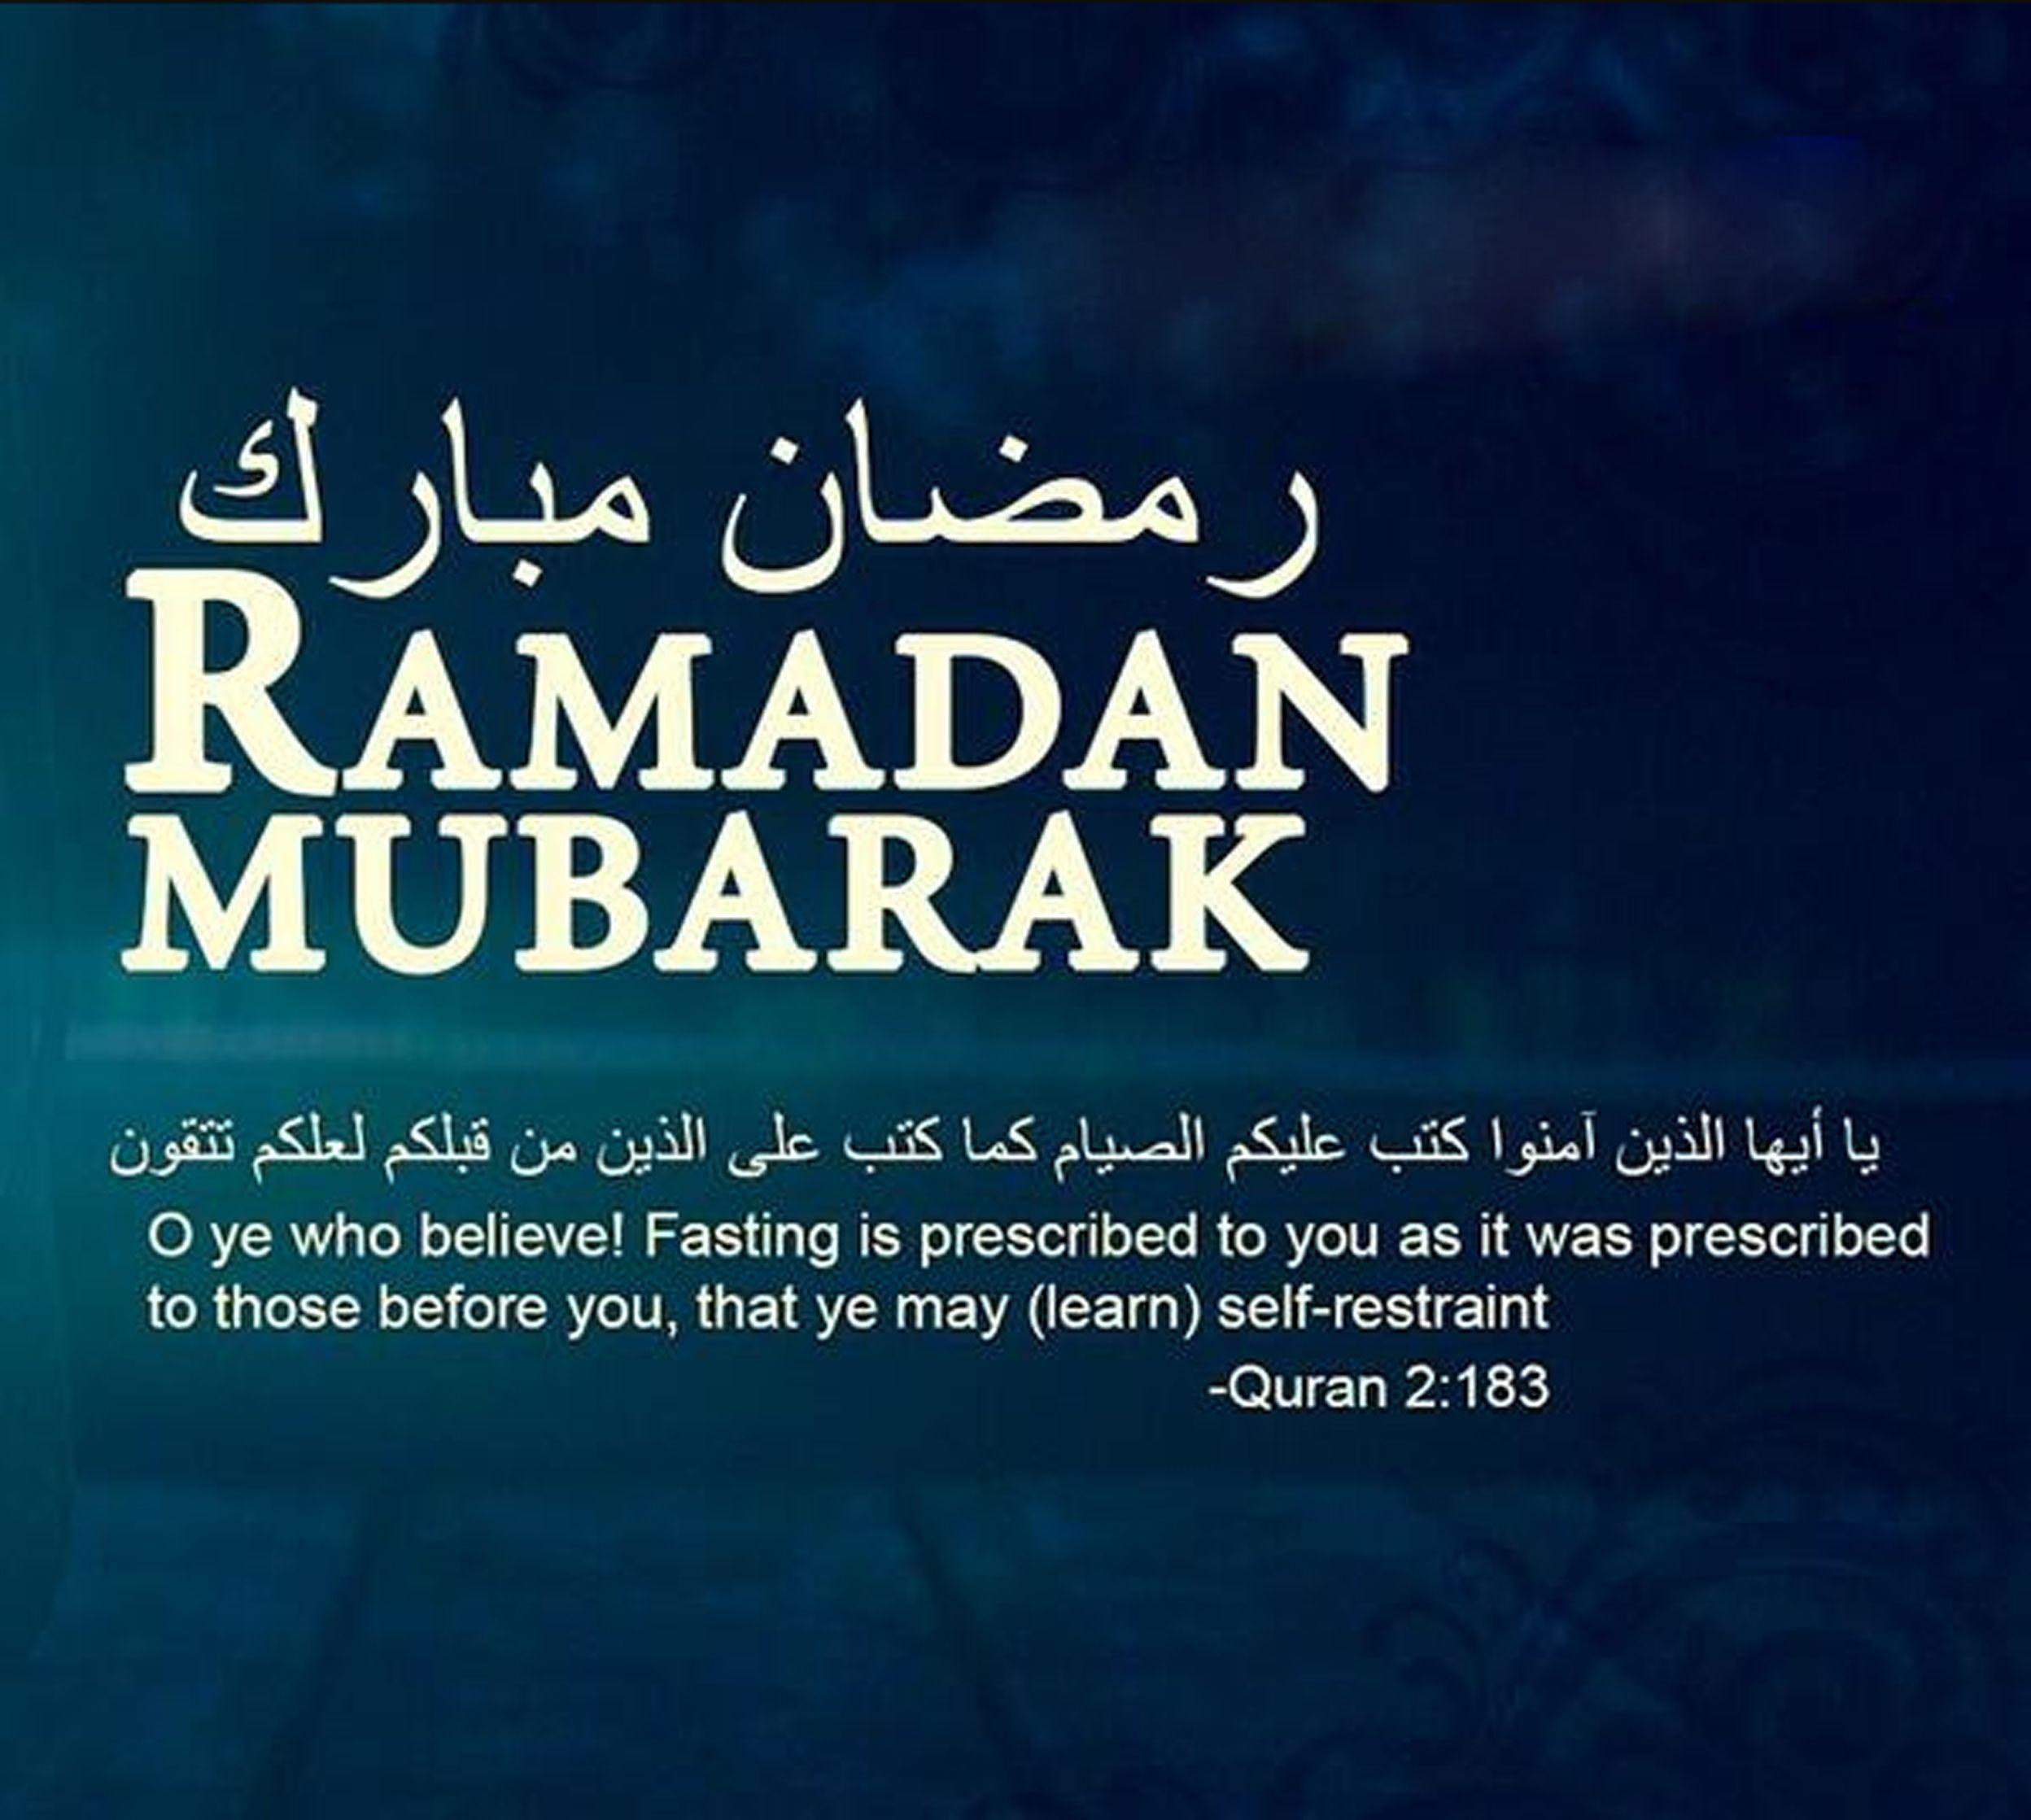 Ramadanmubarak Ramdan2019 Ramadanquotes Ramadangreetings Ramadanwishes Ramadanmubarakdp Ramadanwallpapers Rama Ramadan Ramadan Messages Ramadan Mubarak